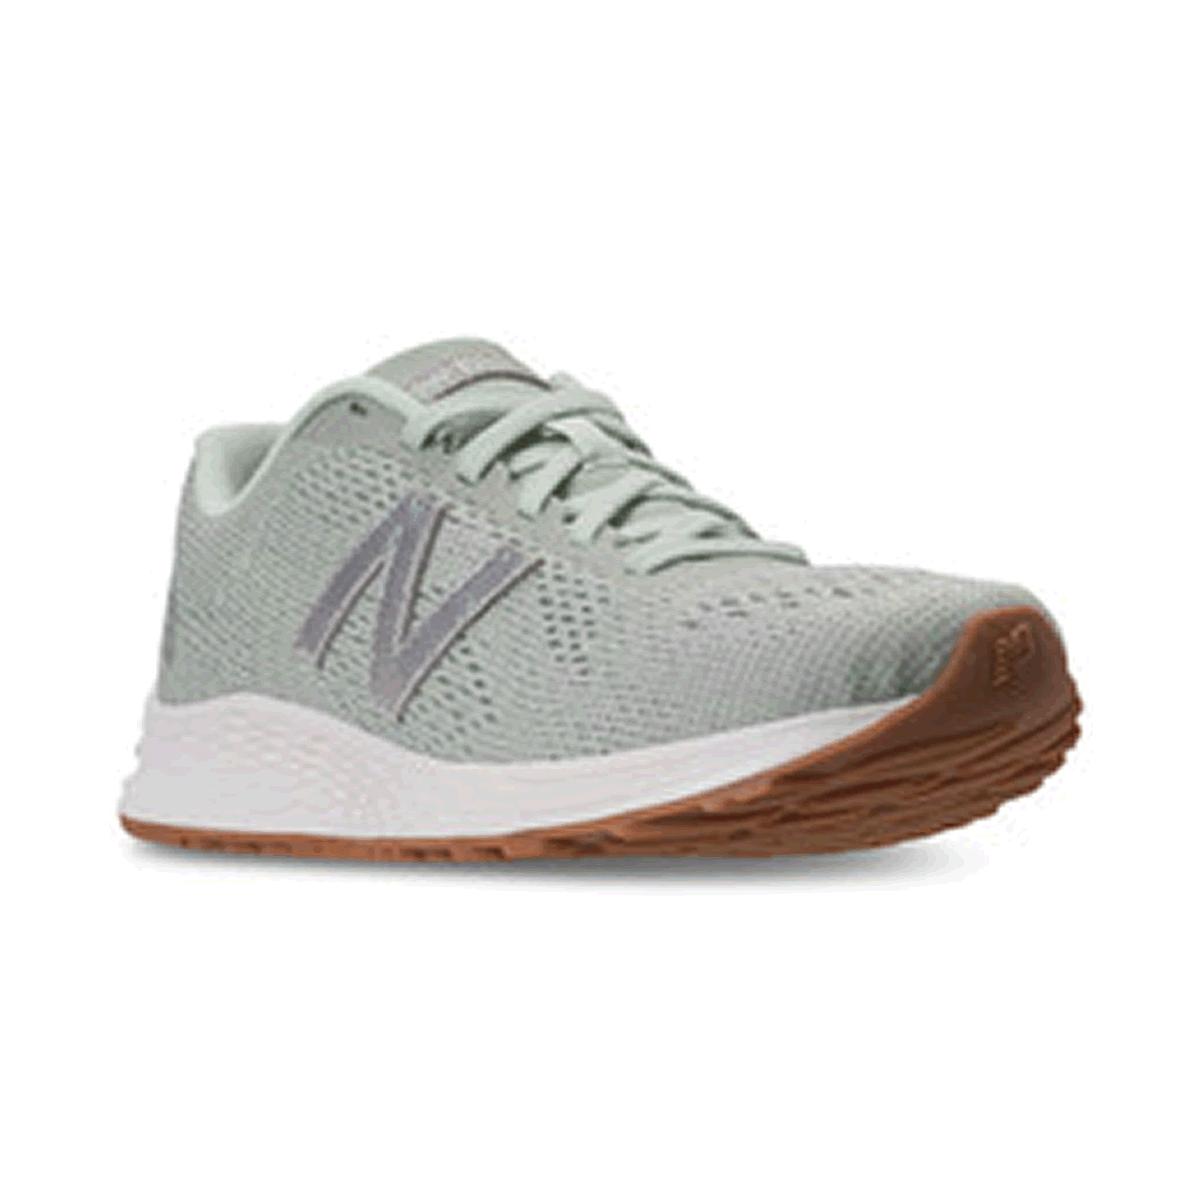 Nike G Series 6 B Red Slide Slip On Walking Shopping Chic Athleisure Comfort